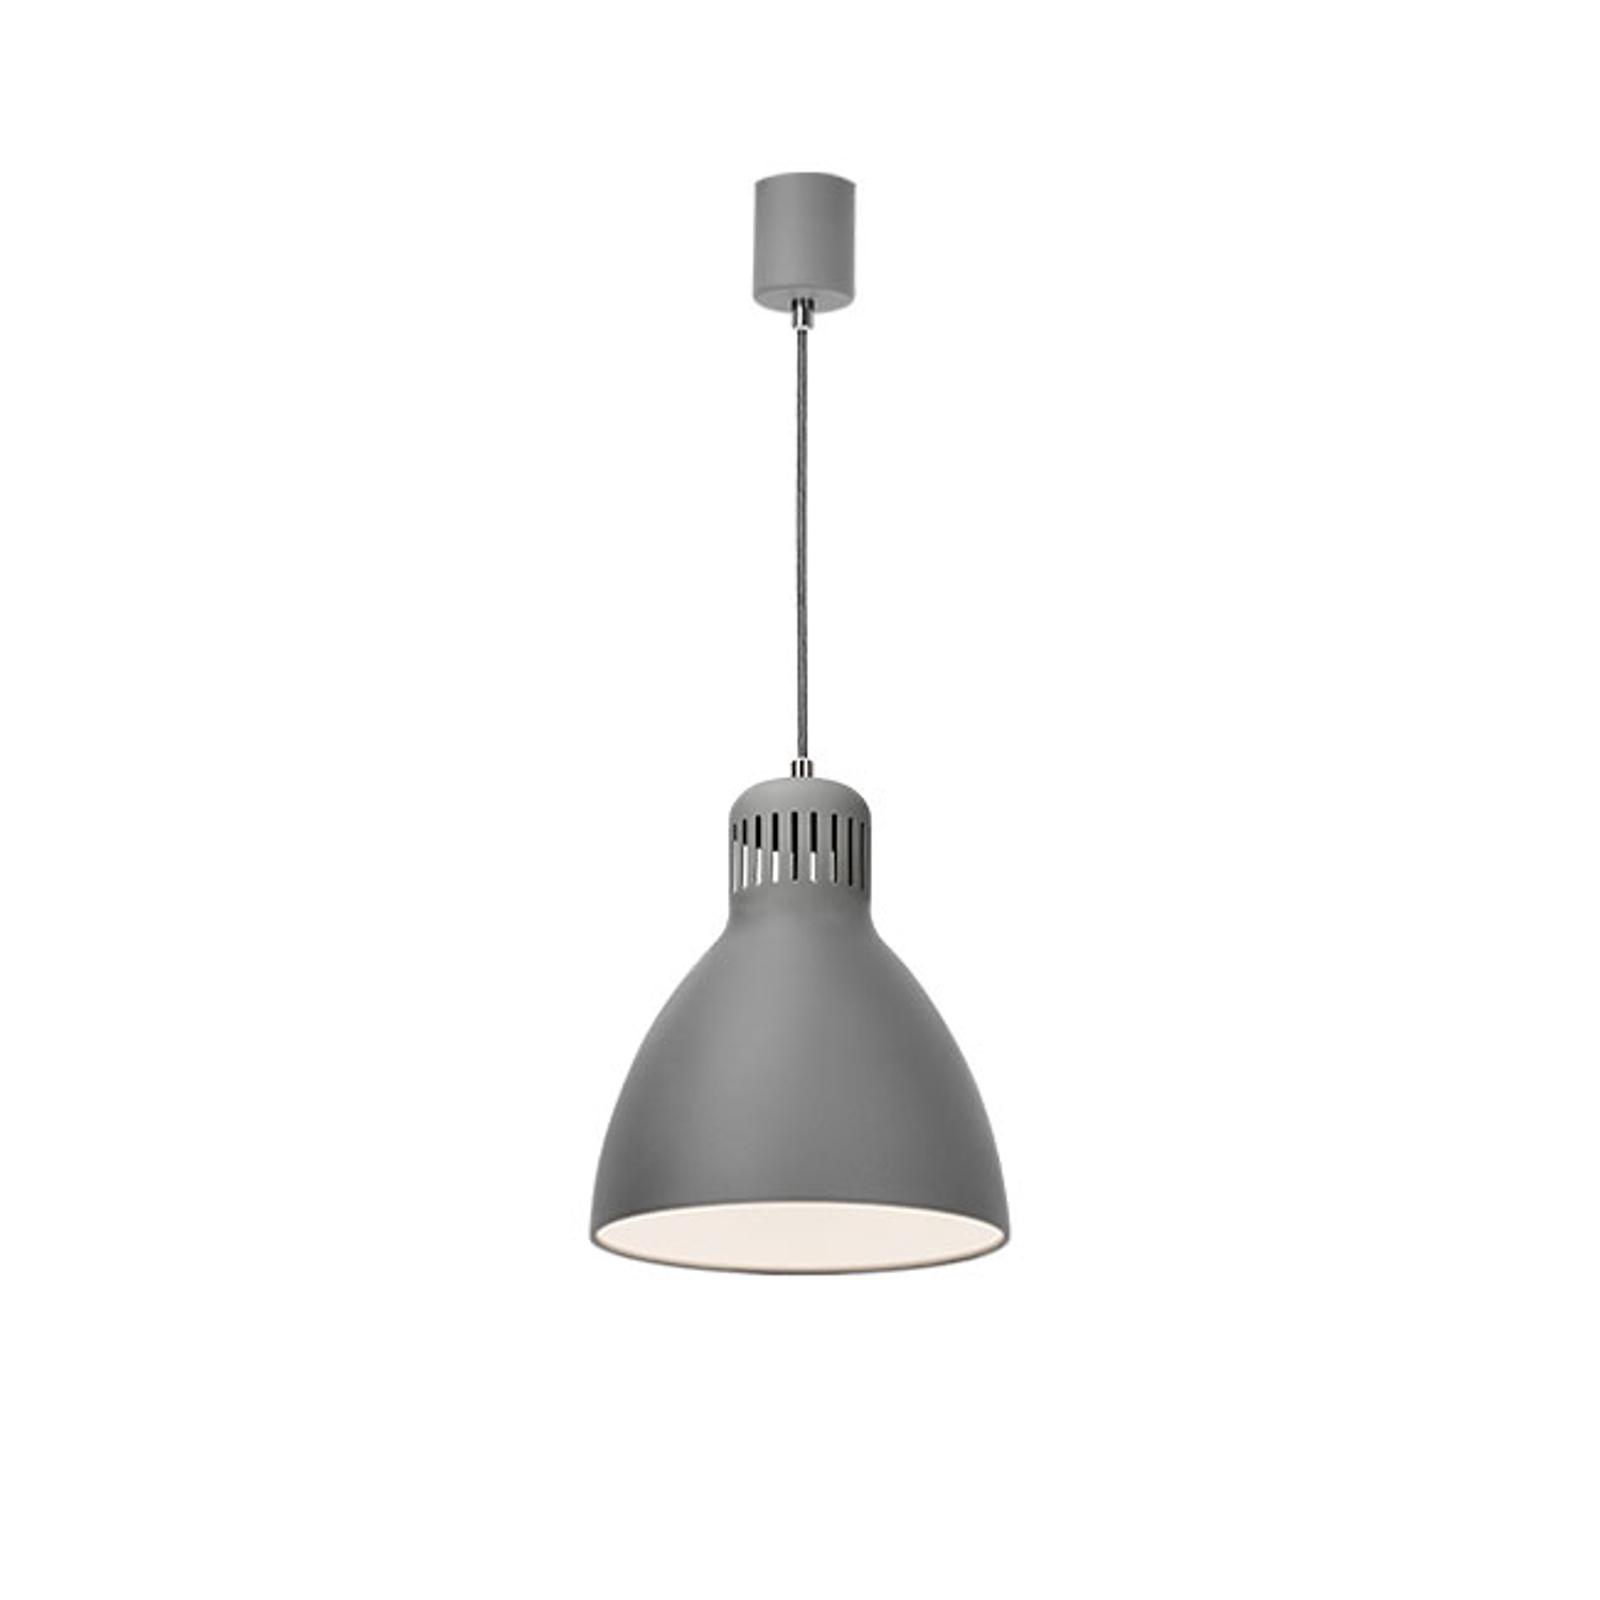 LED hanglamp L-1, 3.000 K, grijs